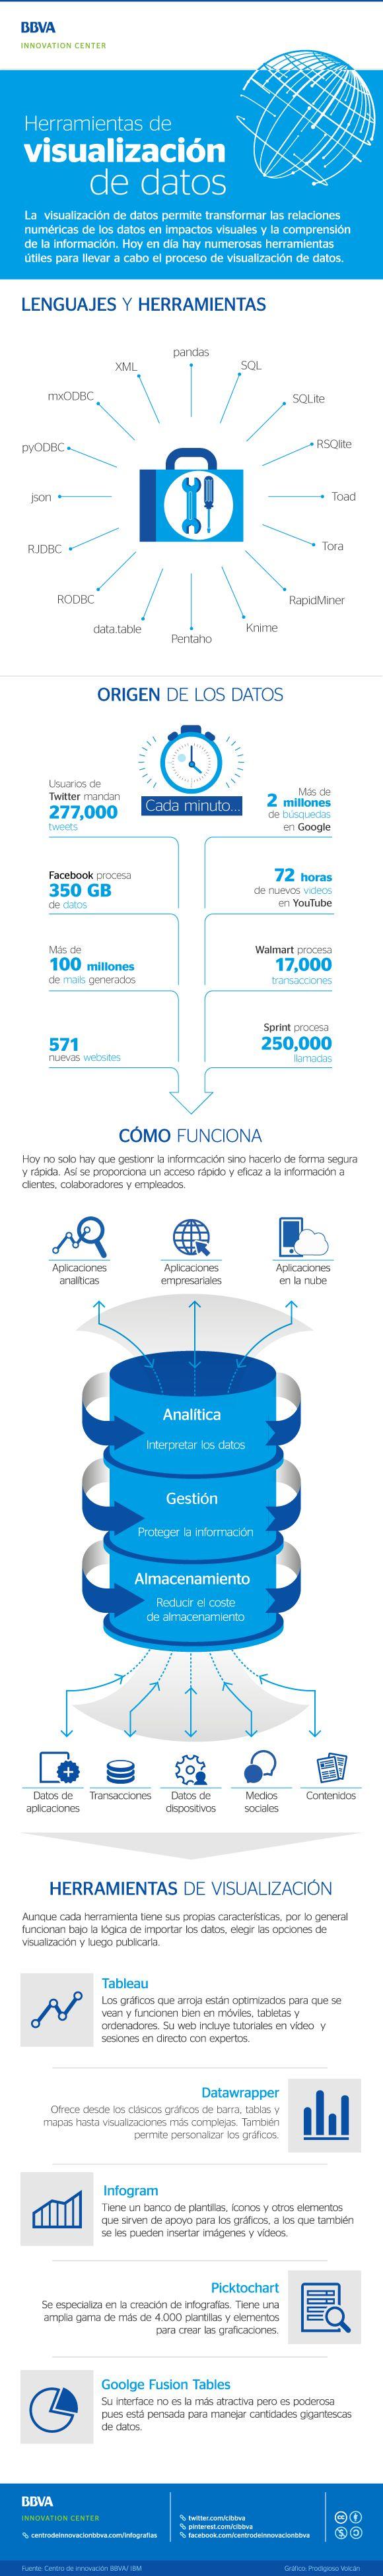 Infografía: Visualización de datos. #BigData #Datos #Tecnología #Innovación #Herramientas #Infografía